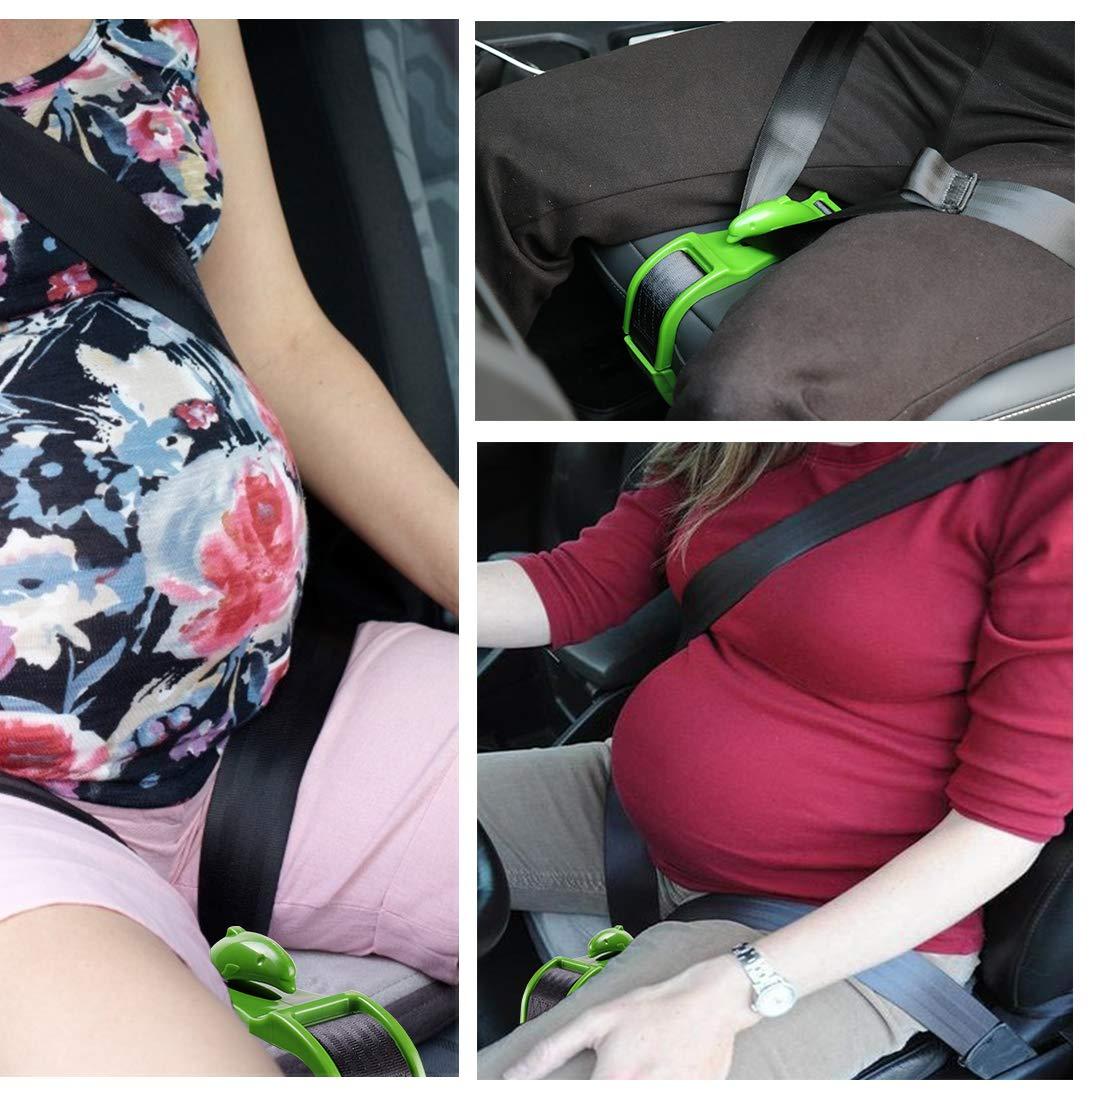 Belly Safety Pregnancy Car Seat Belt Adjuster Adjustable Seatbelt Hook Protection for Moms Safety Driving and Unborn Baby Pregnancy Maternity Bump Belt